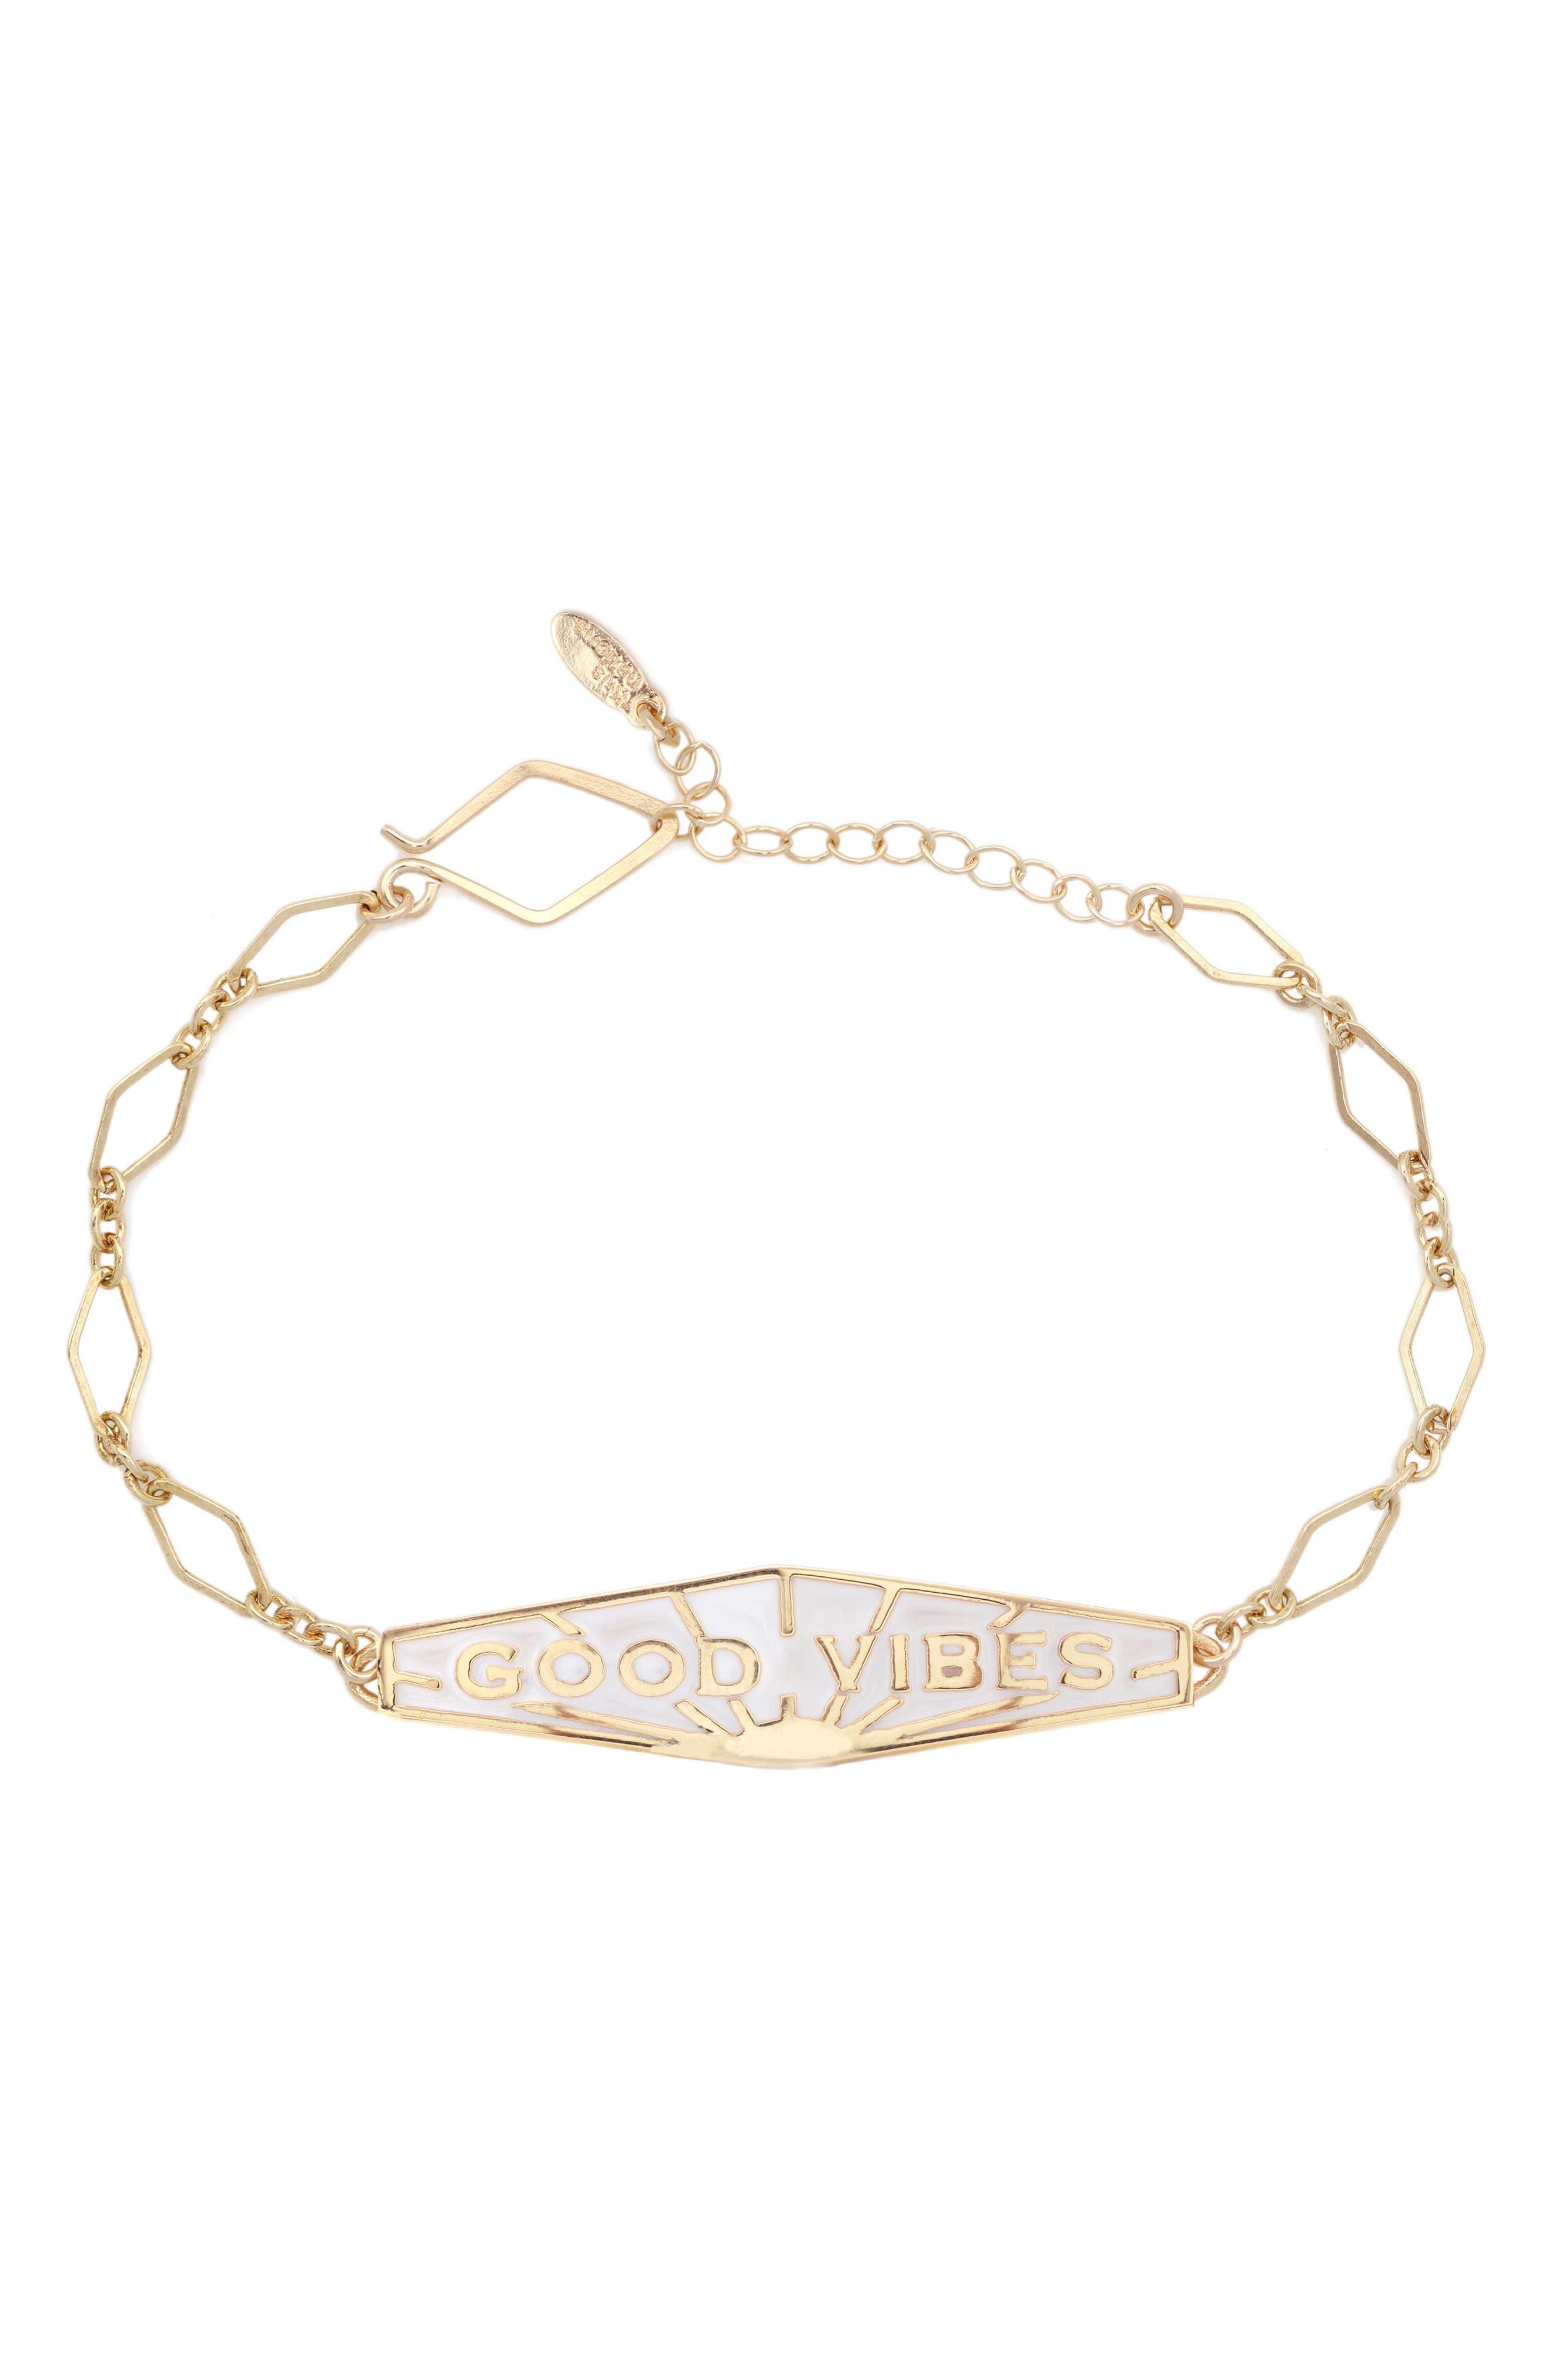 Good Vibes Bracelet,                             Main thumbnail 1, color,                             GOLD